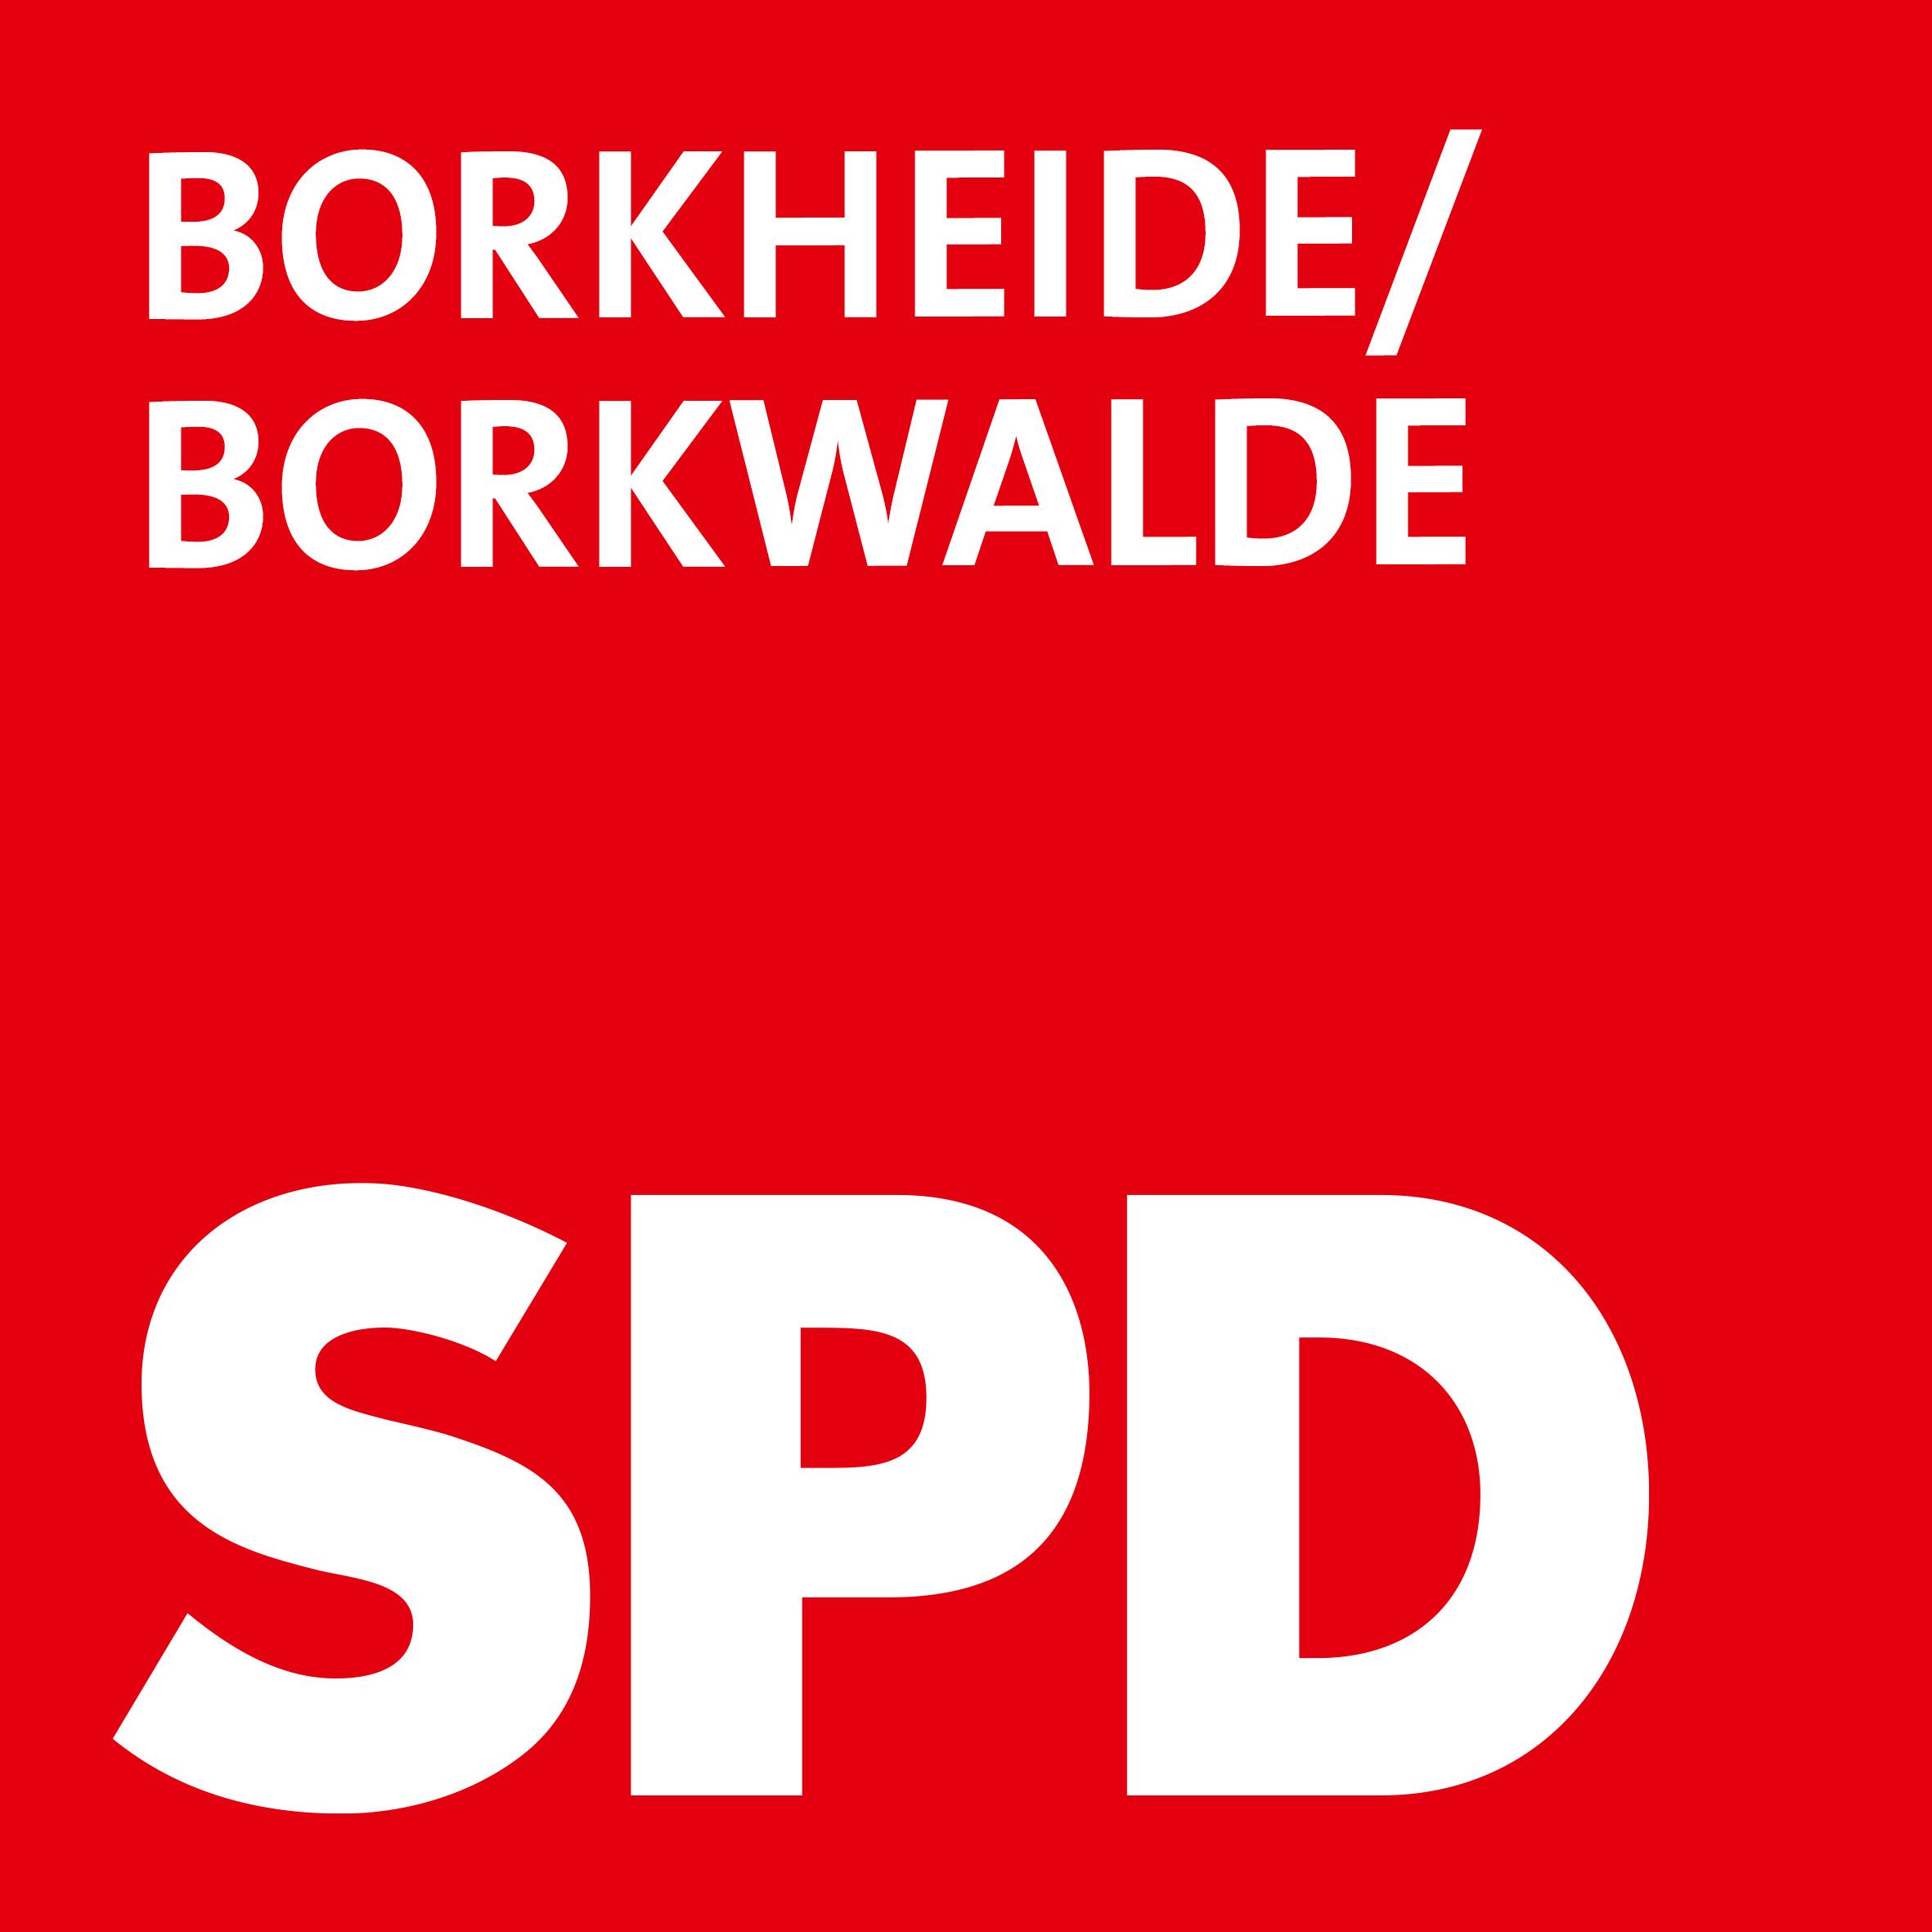 SPD Borkheide/Borkwalde